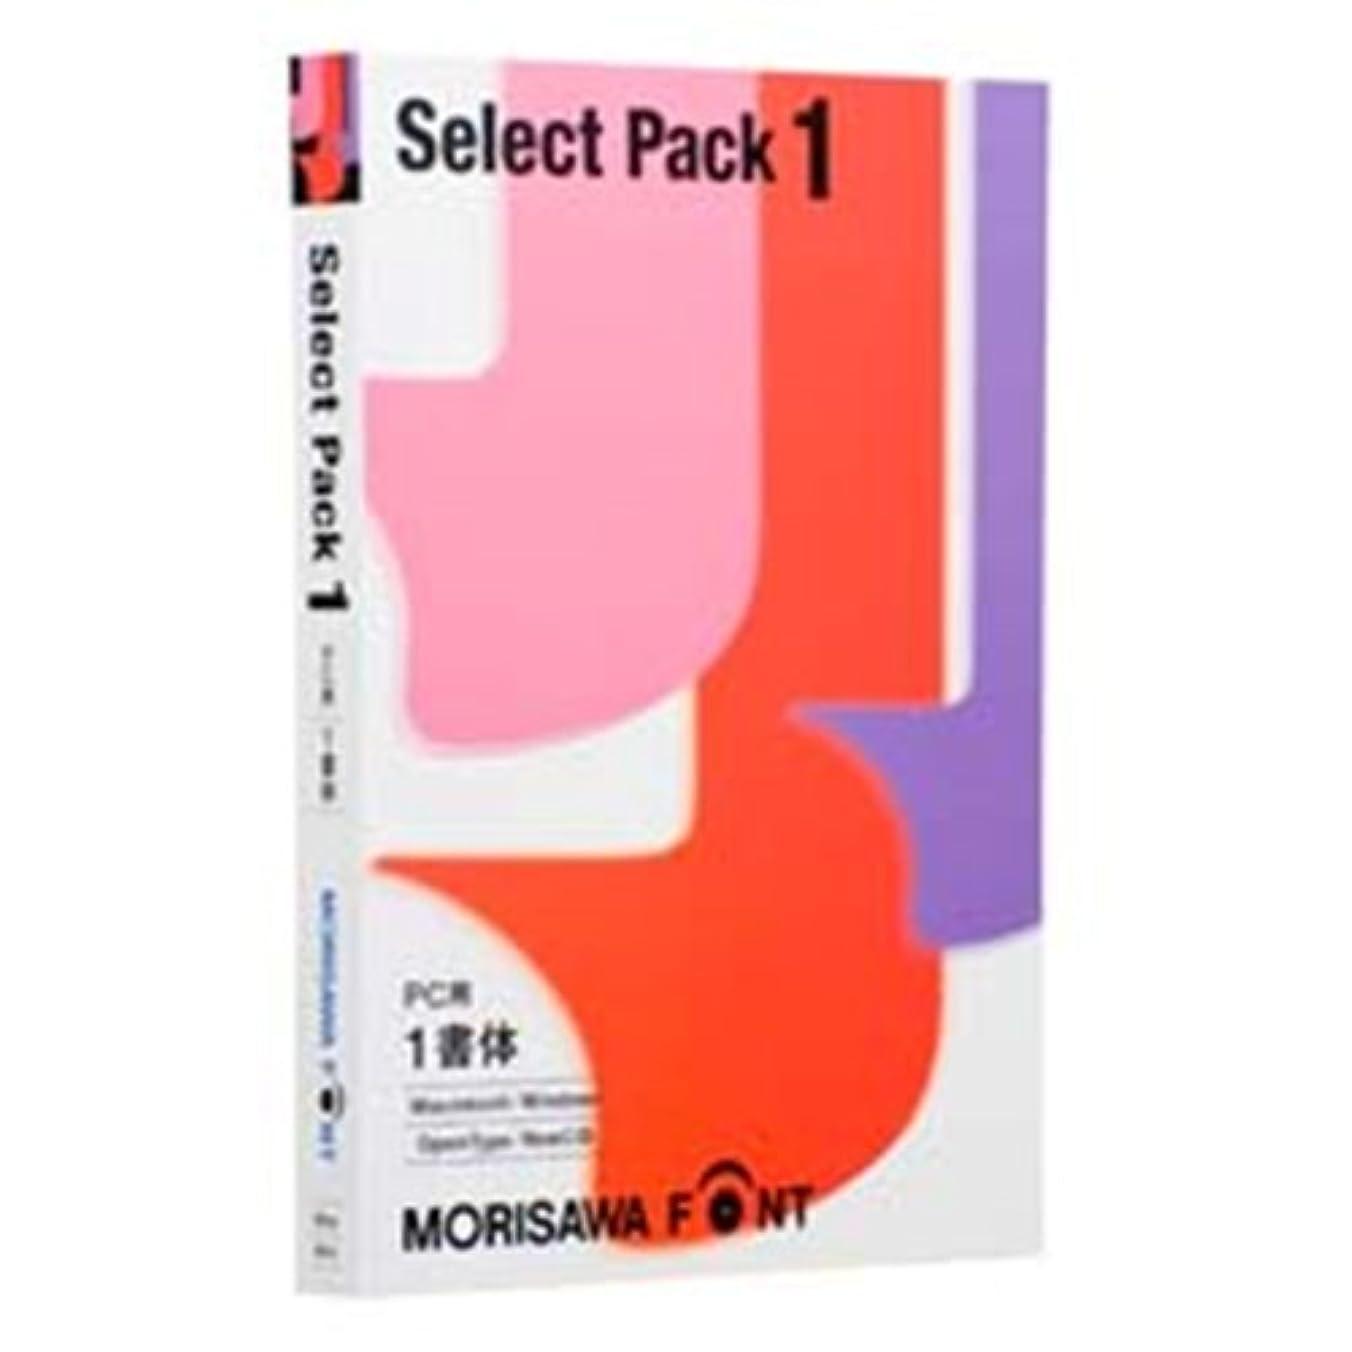 MORISAWA Font Select Pack 1 [PC用]